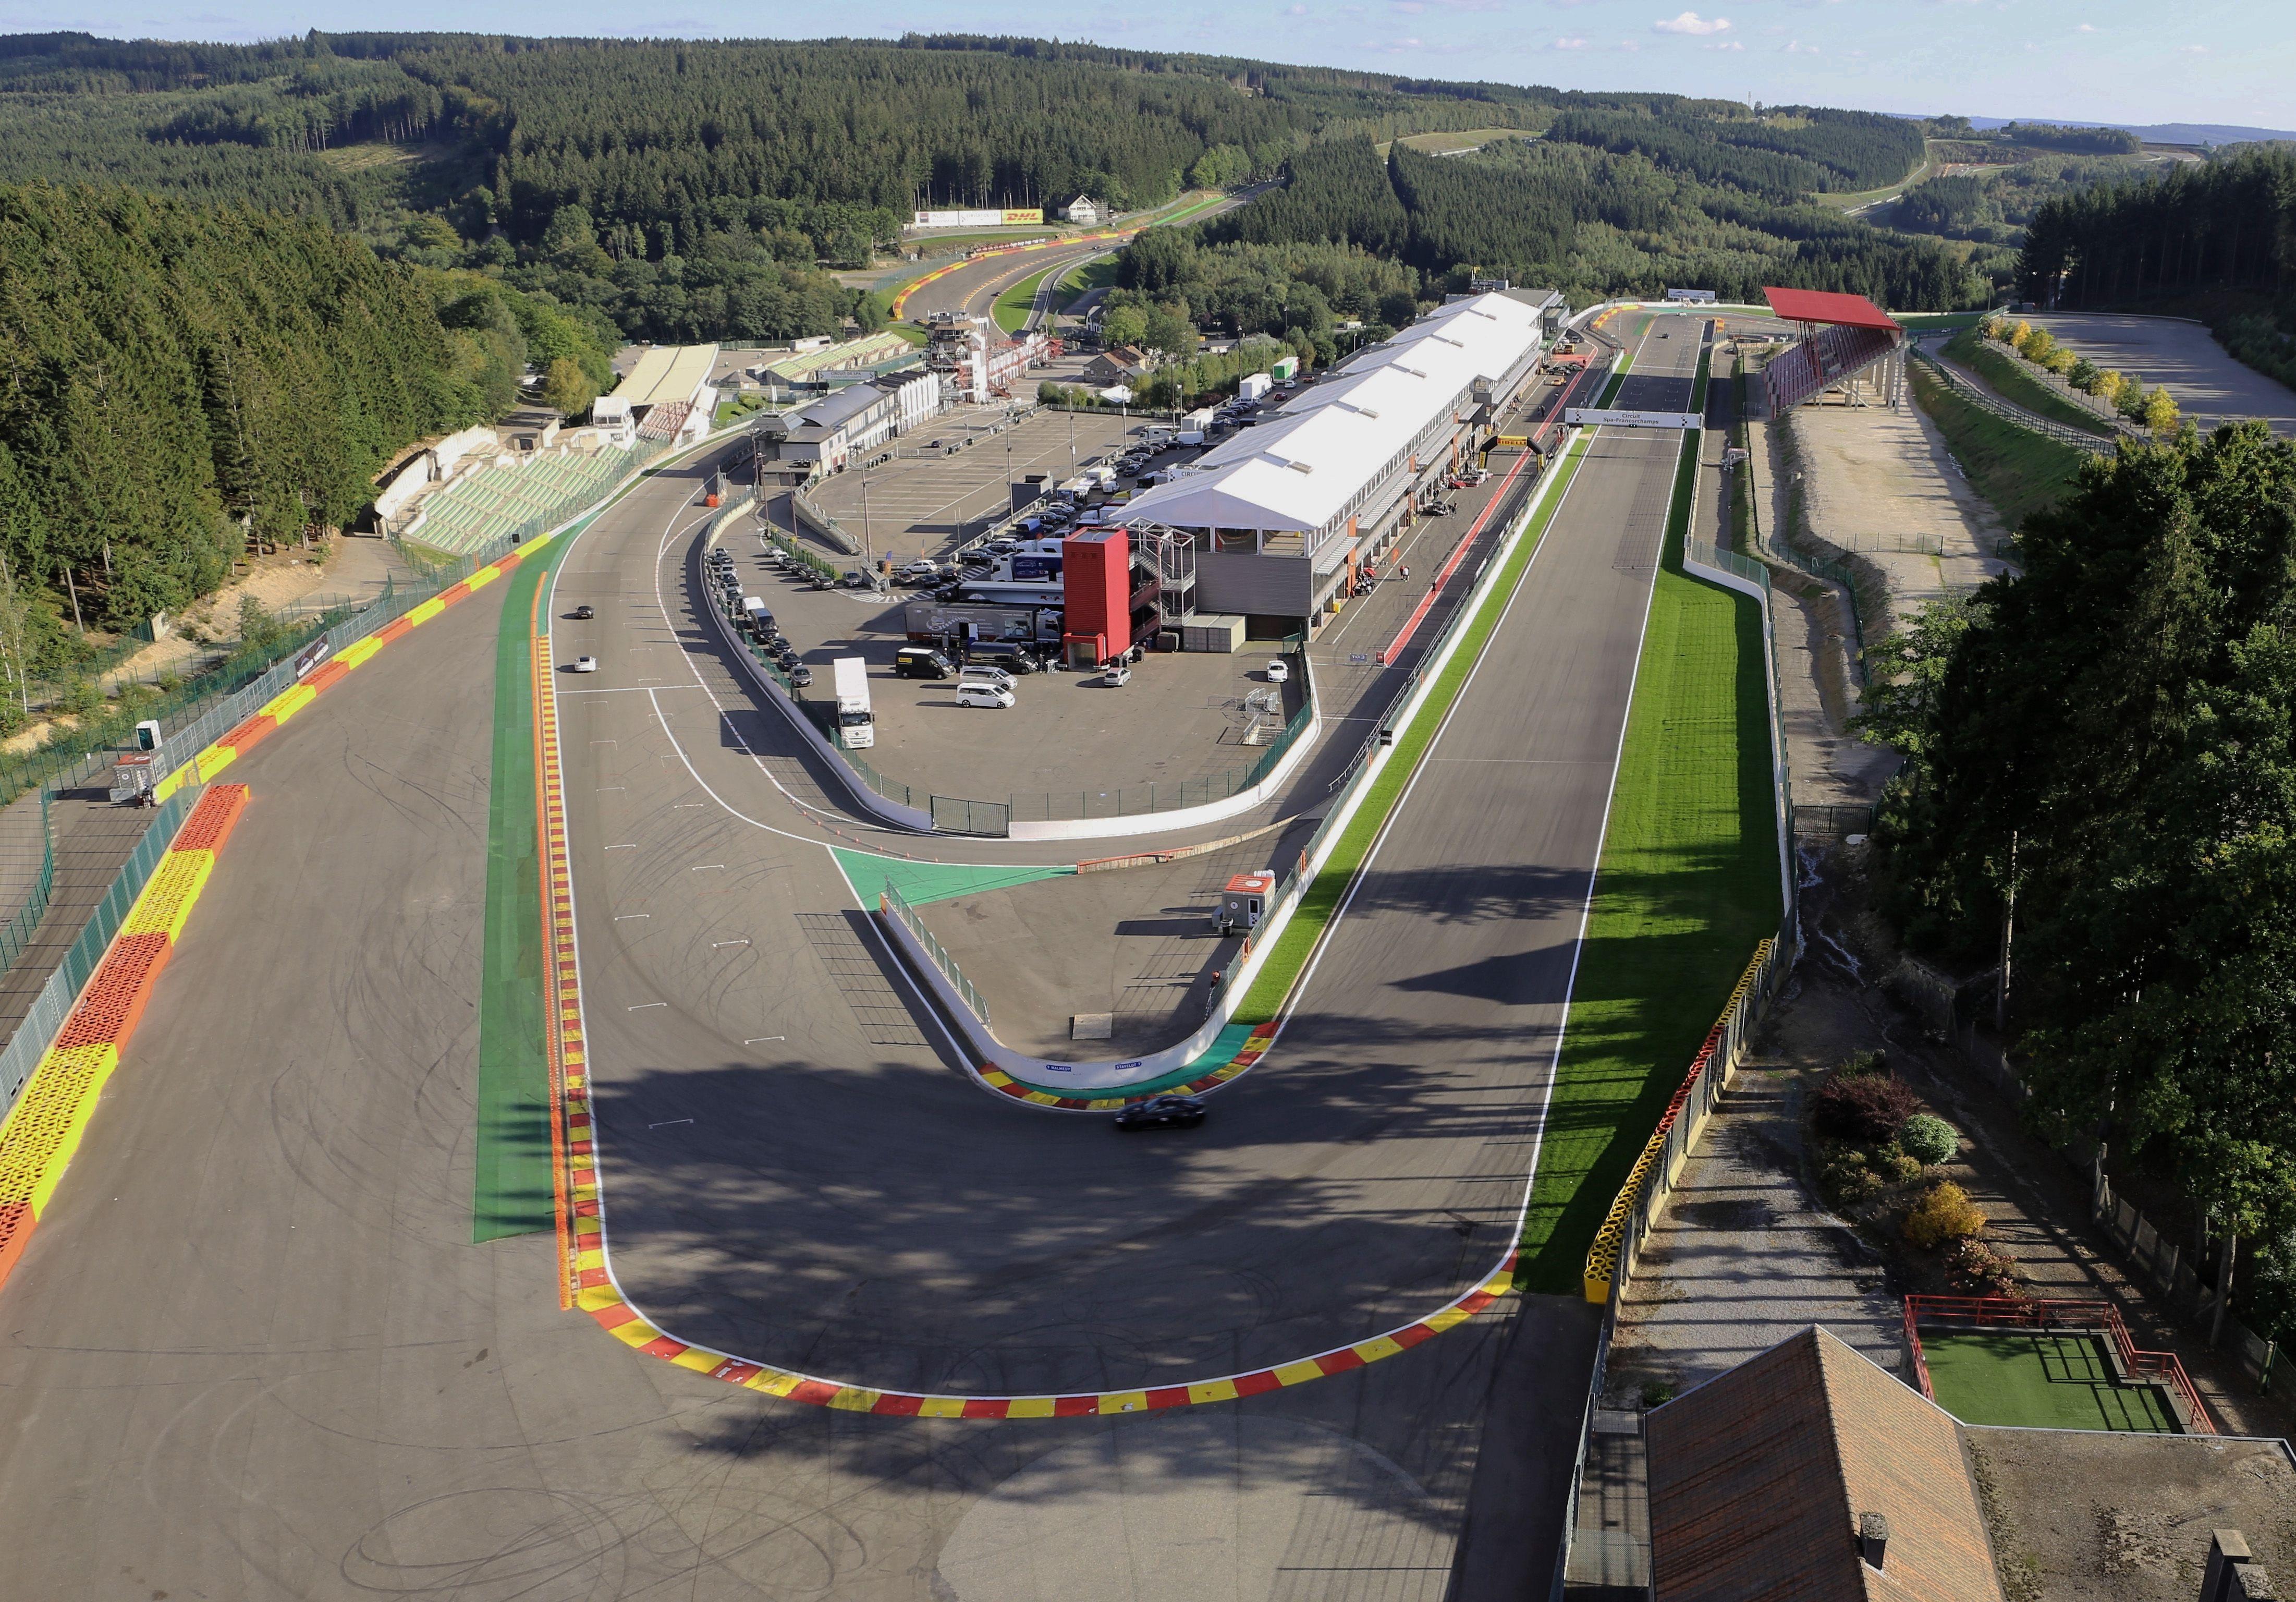 Circuito De Spa Francorchamps : Circuit de spa francorchamps belgium the ardennes